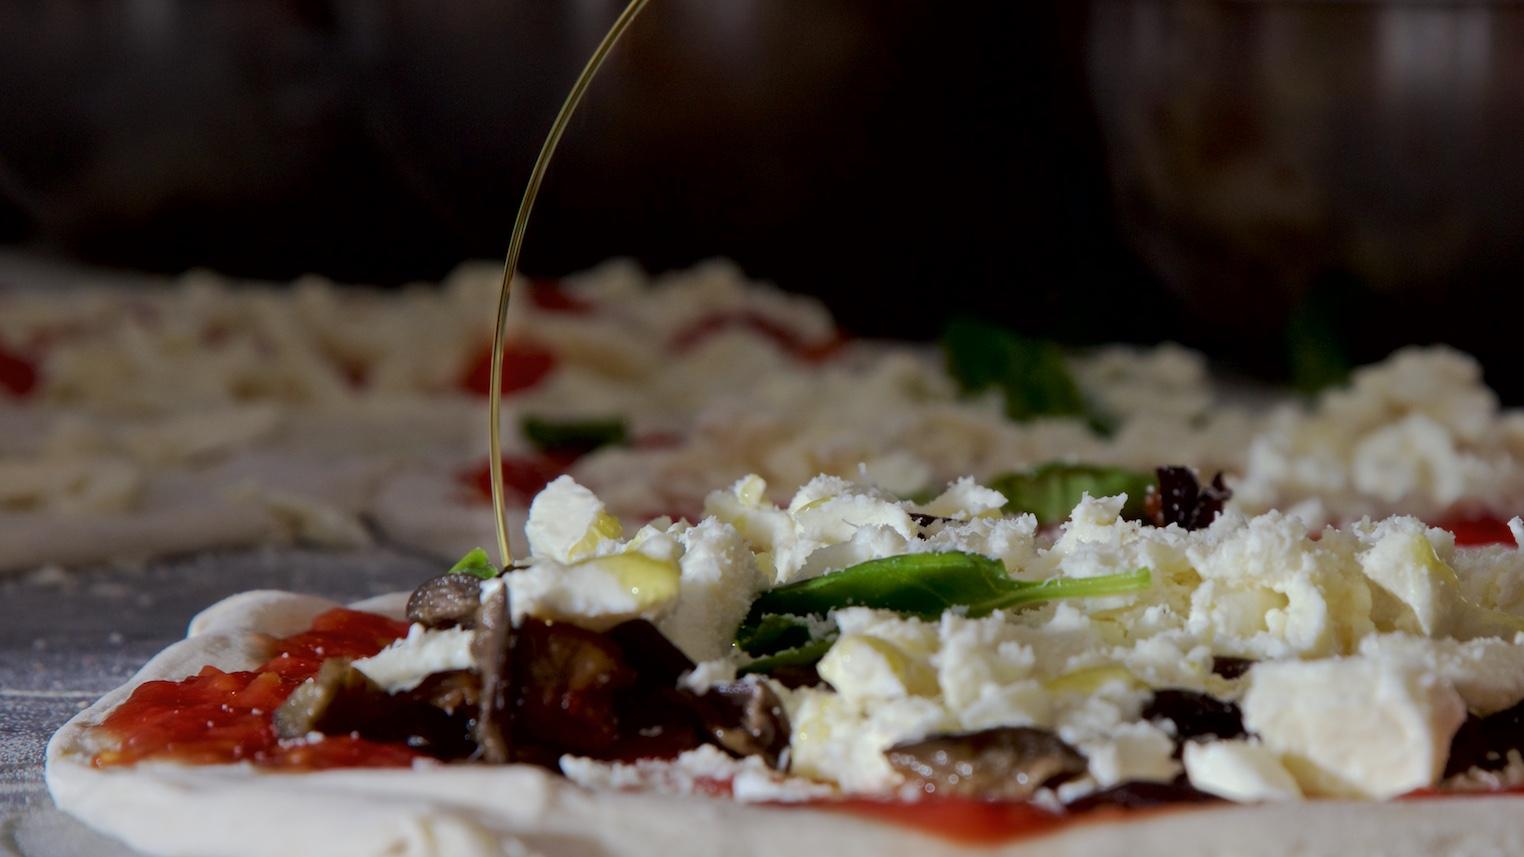 122-Pizzazzà-Nologo_IMG_0015